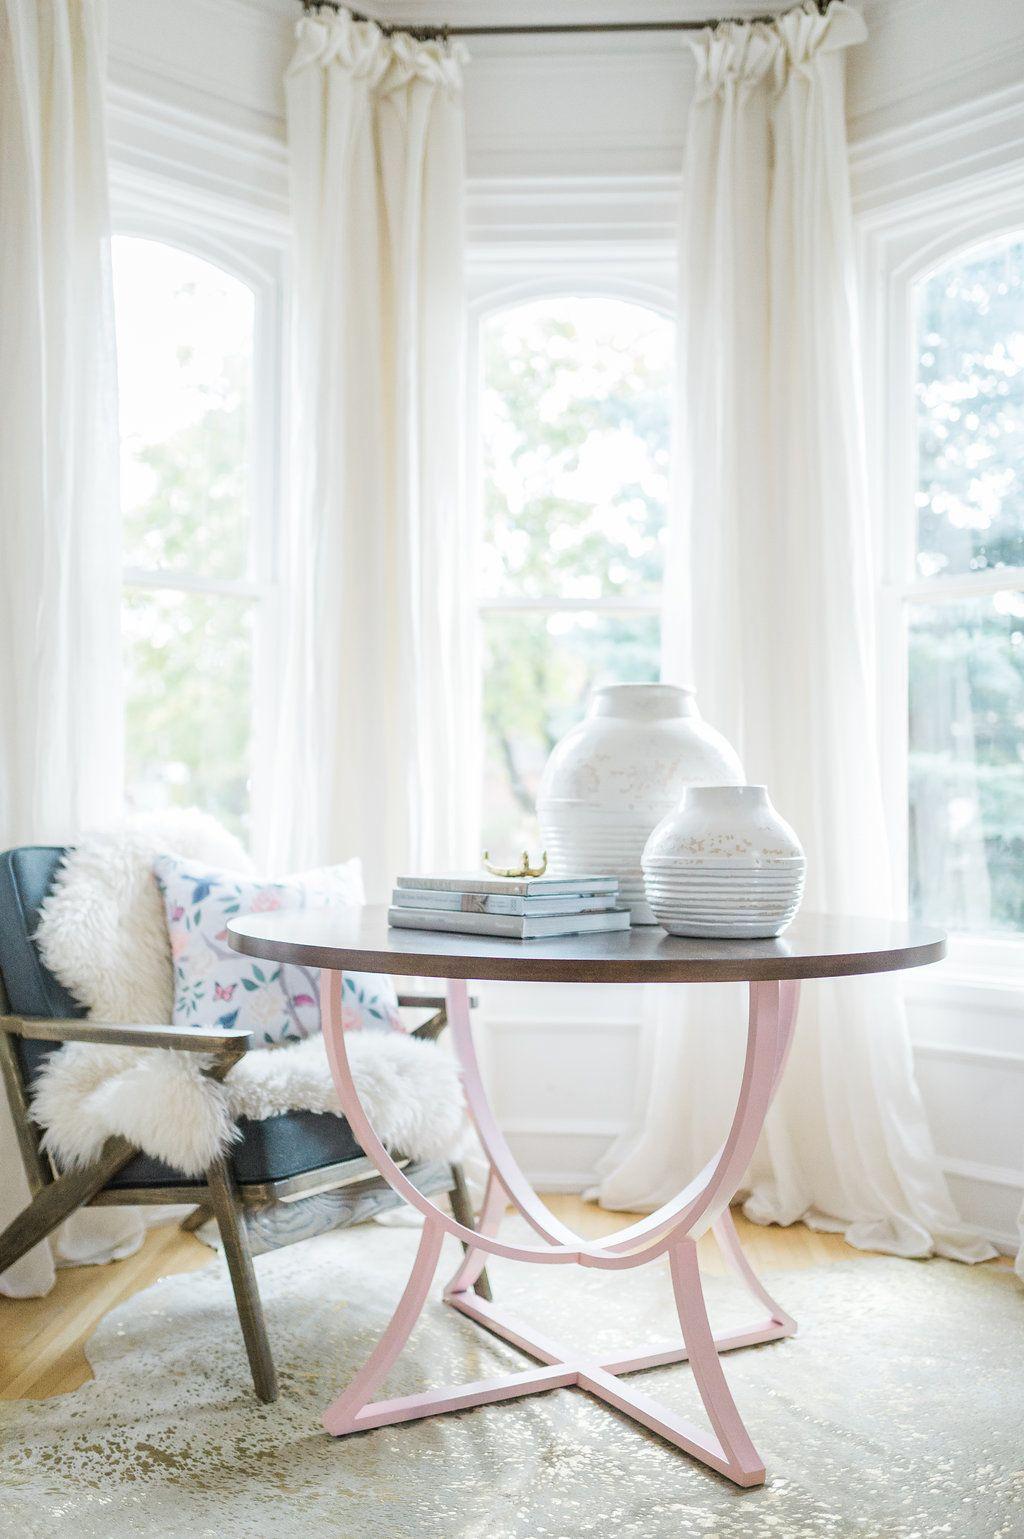 Modern Parisian Living Room Reveal: Wainscoting, Paint, Lighting ...